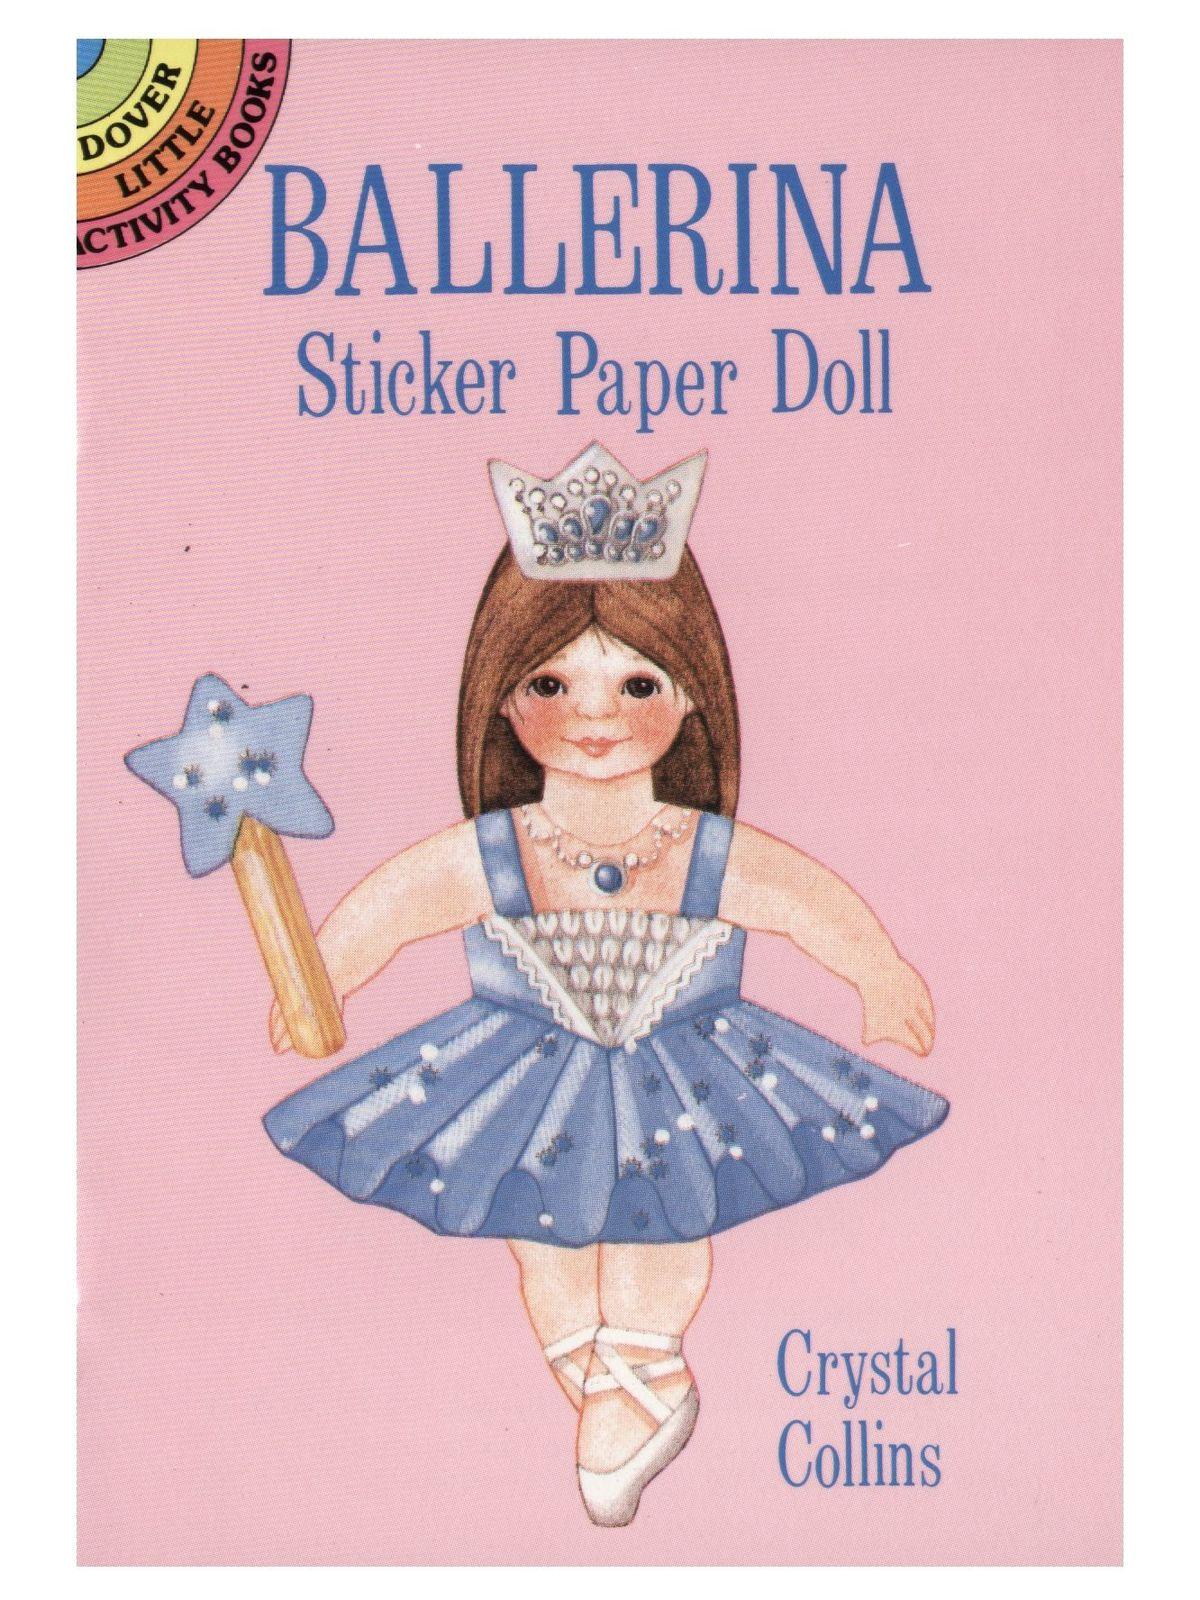 Ballerina Sticker Paper Doll